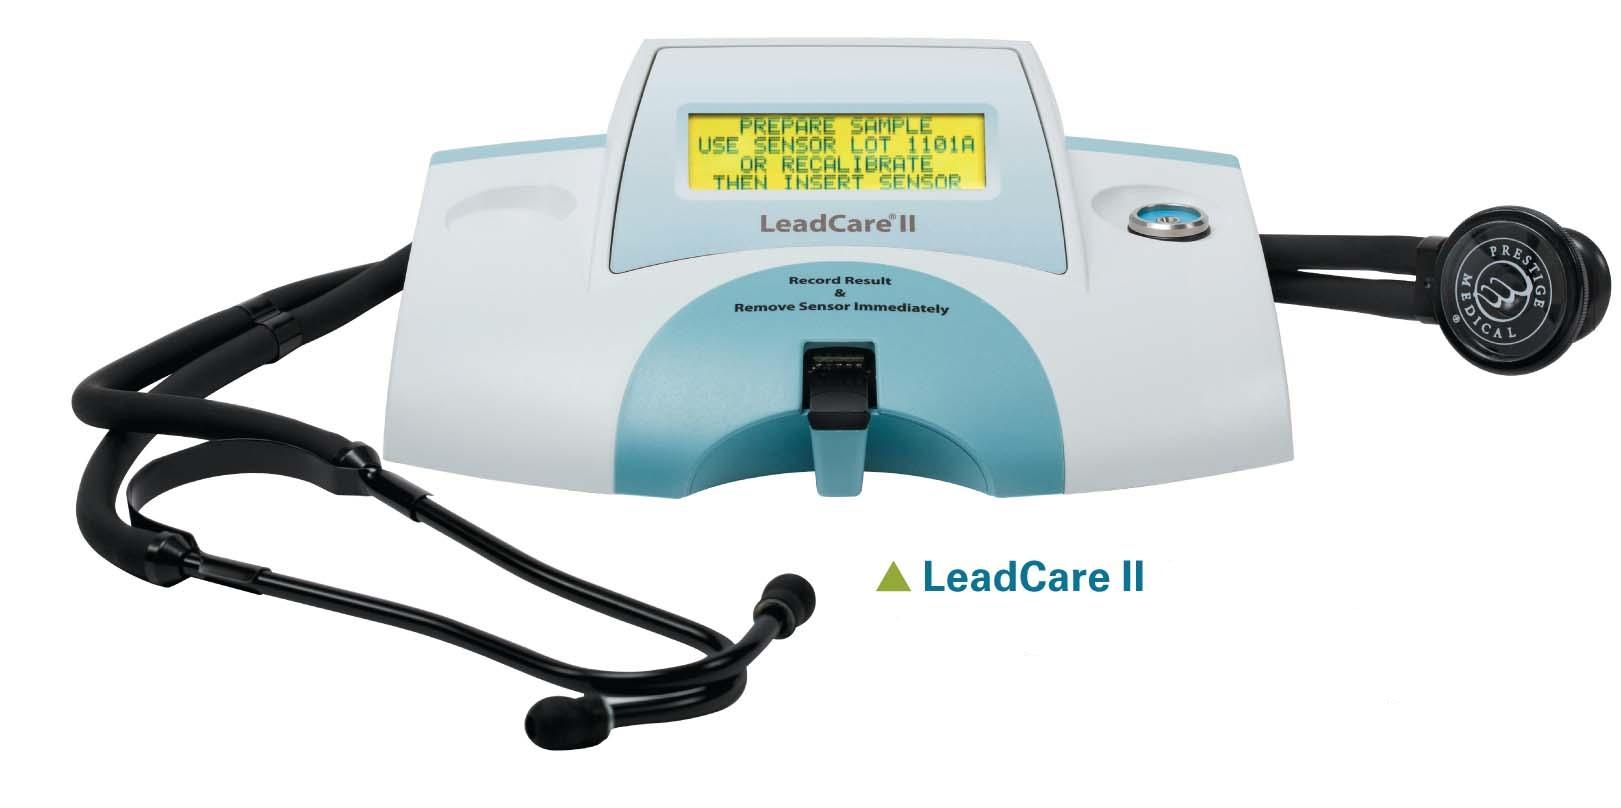 cntped1214_PedsV2_Leadcare.jpg